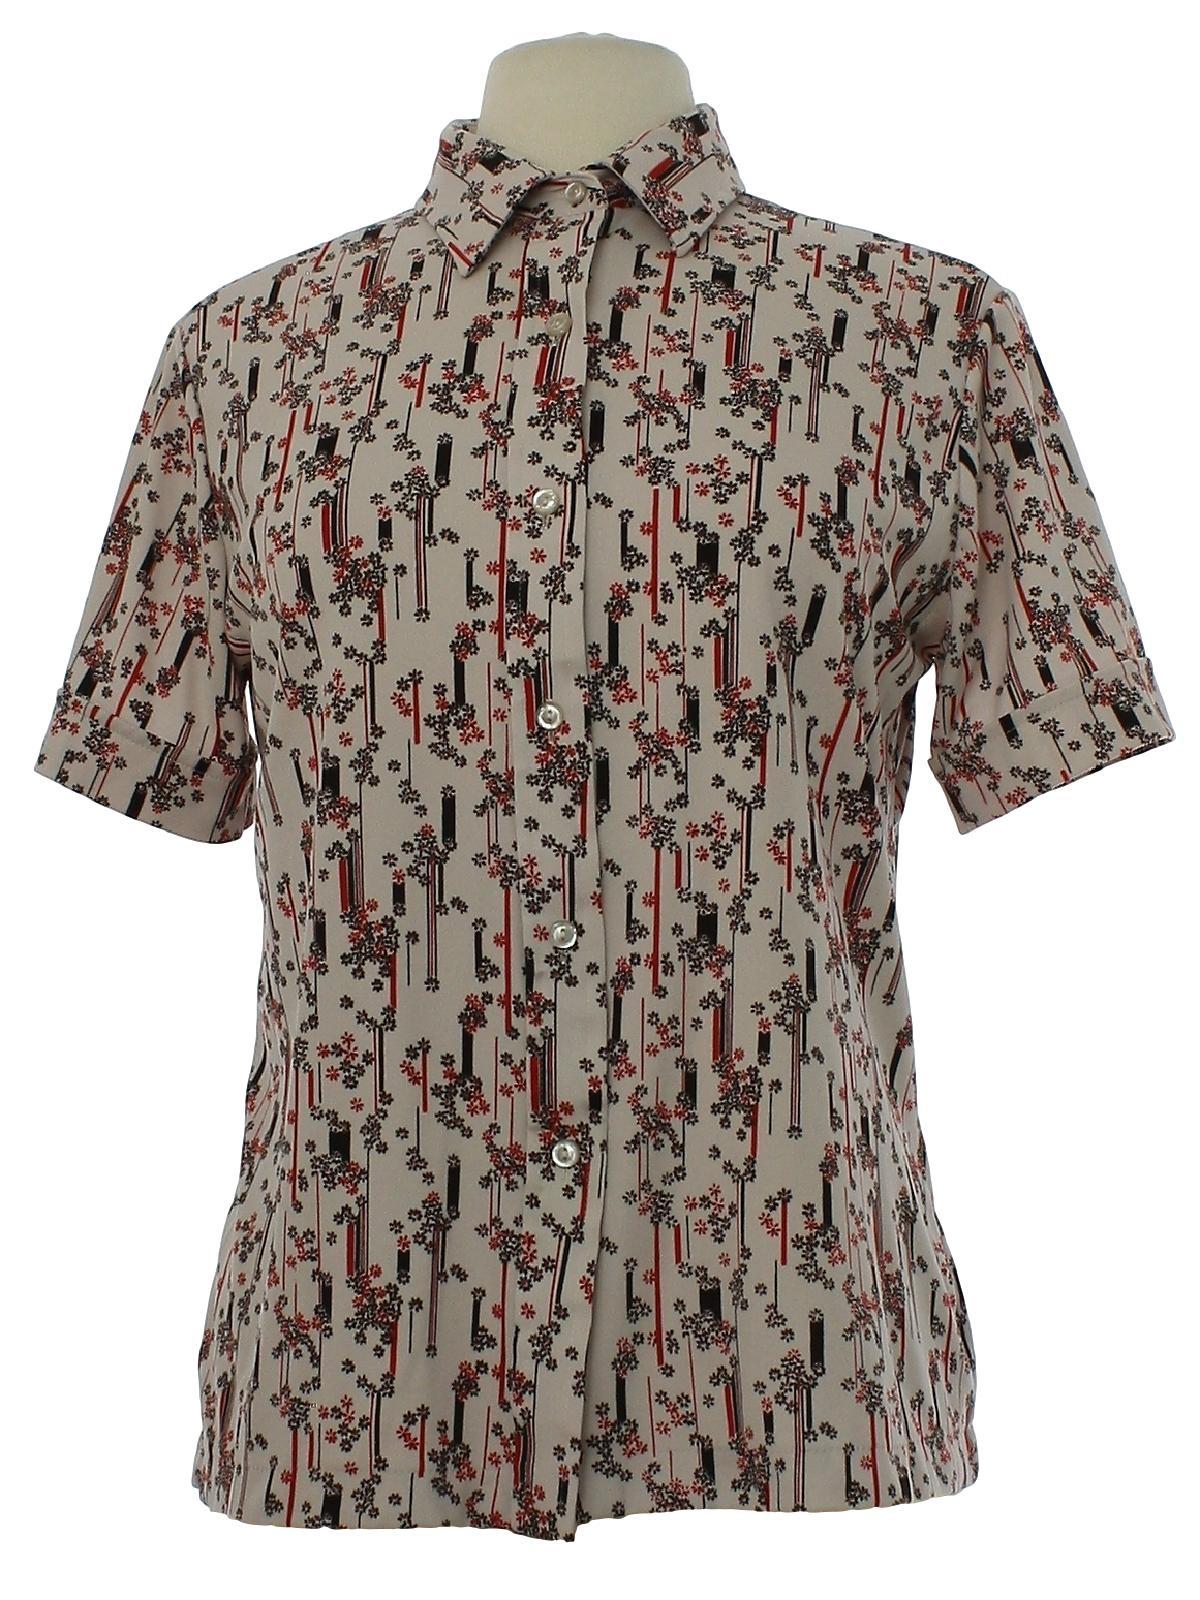 Vintage 1970\u2019s retro pattern mint green /& brown floral plaid mixed pattern blouse button front shirt Women\u2019s S Nylon knit